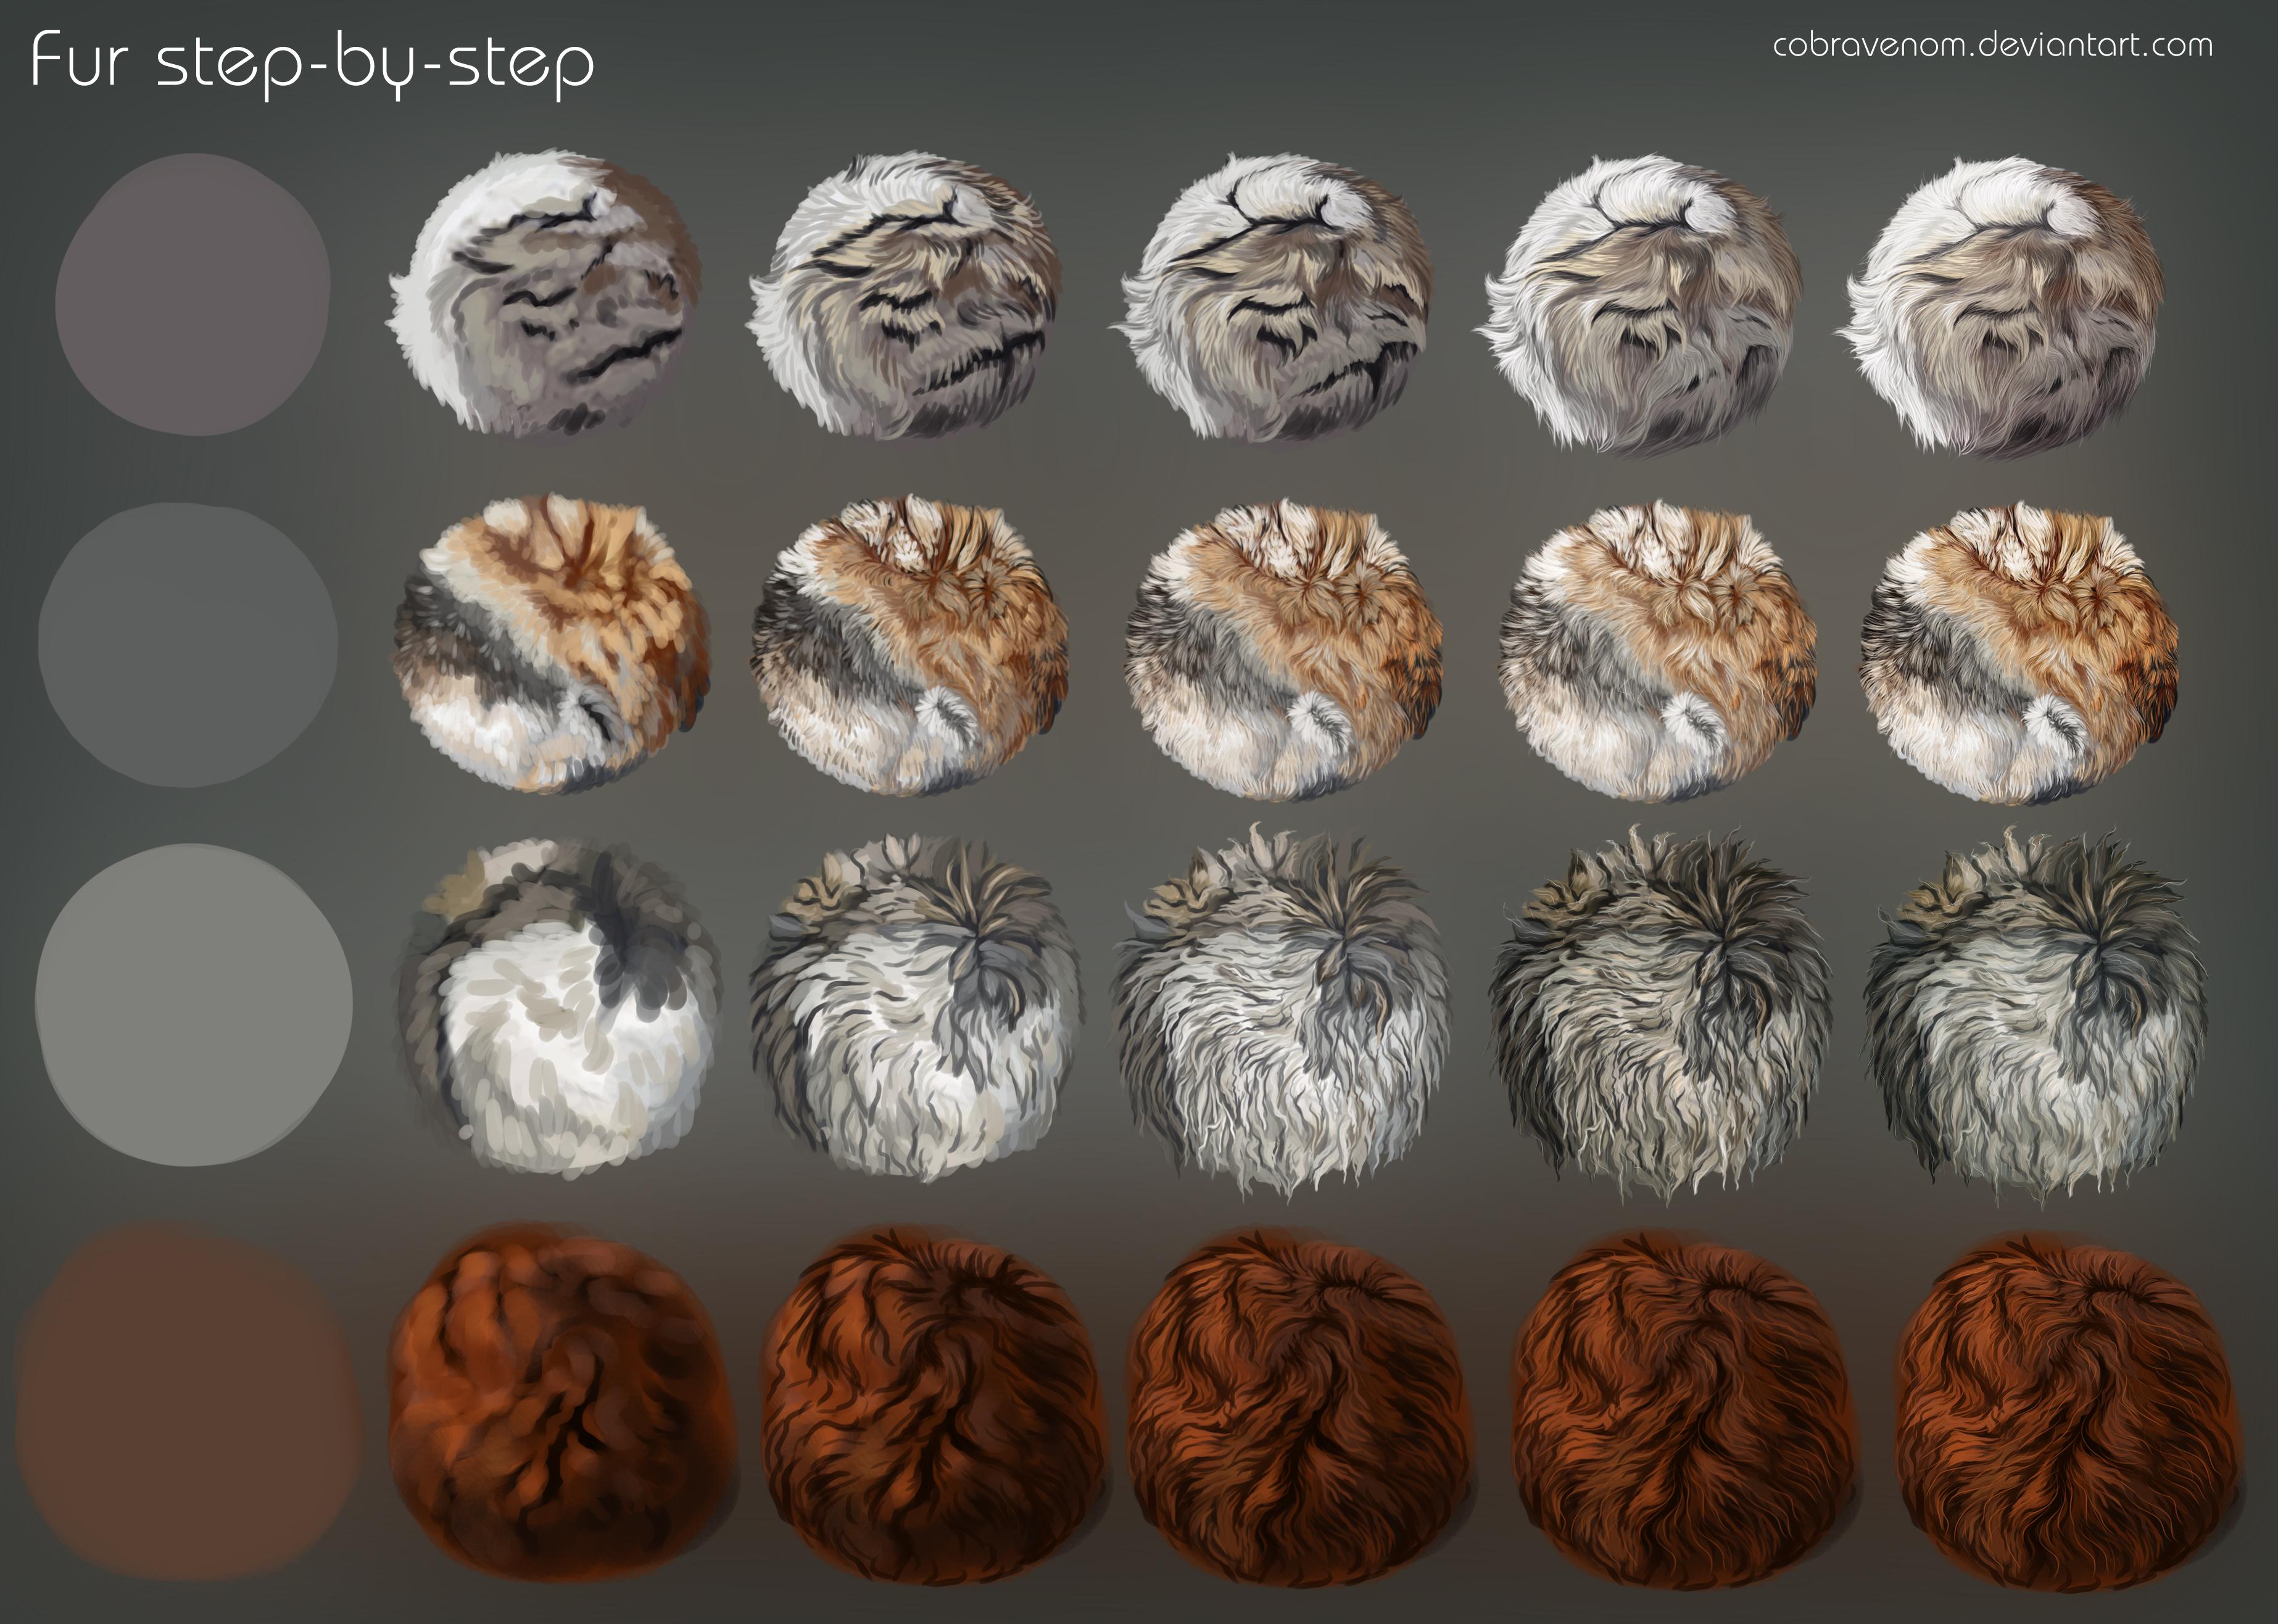 Fur Stepbystep By Cobravenom